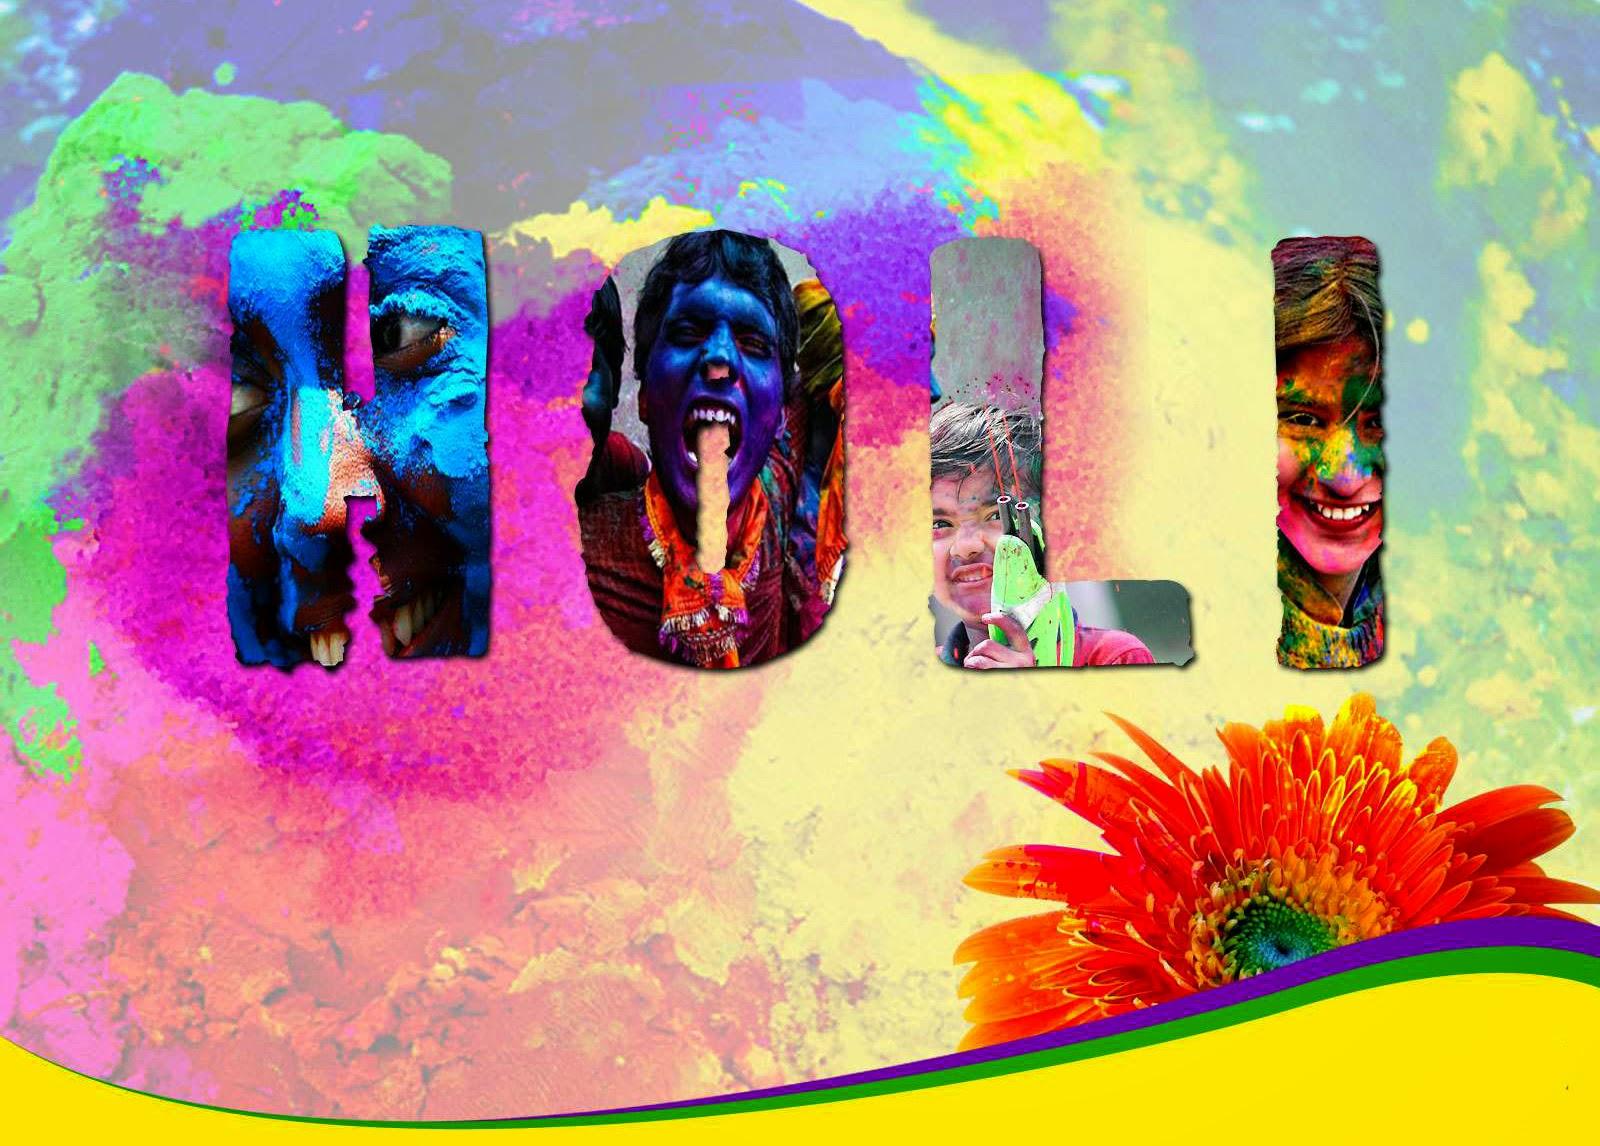 Wallpaper download karna hai - Happy Holi Photos Holi 2017 Photos Holi Pictures Hd Happy Holi Wallpapers